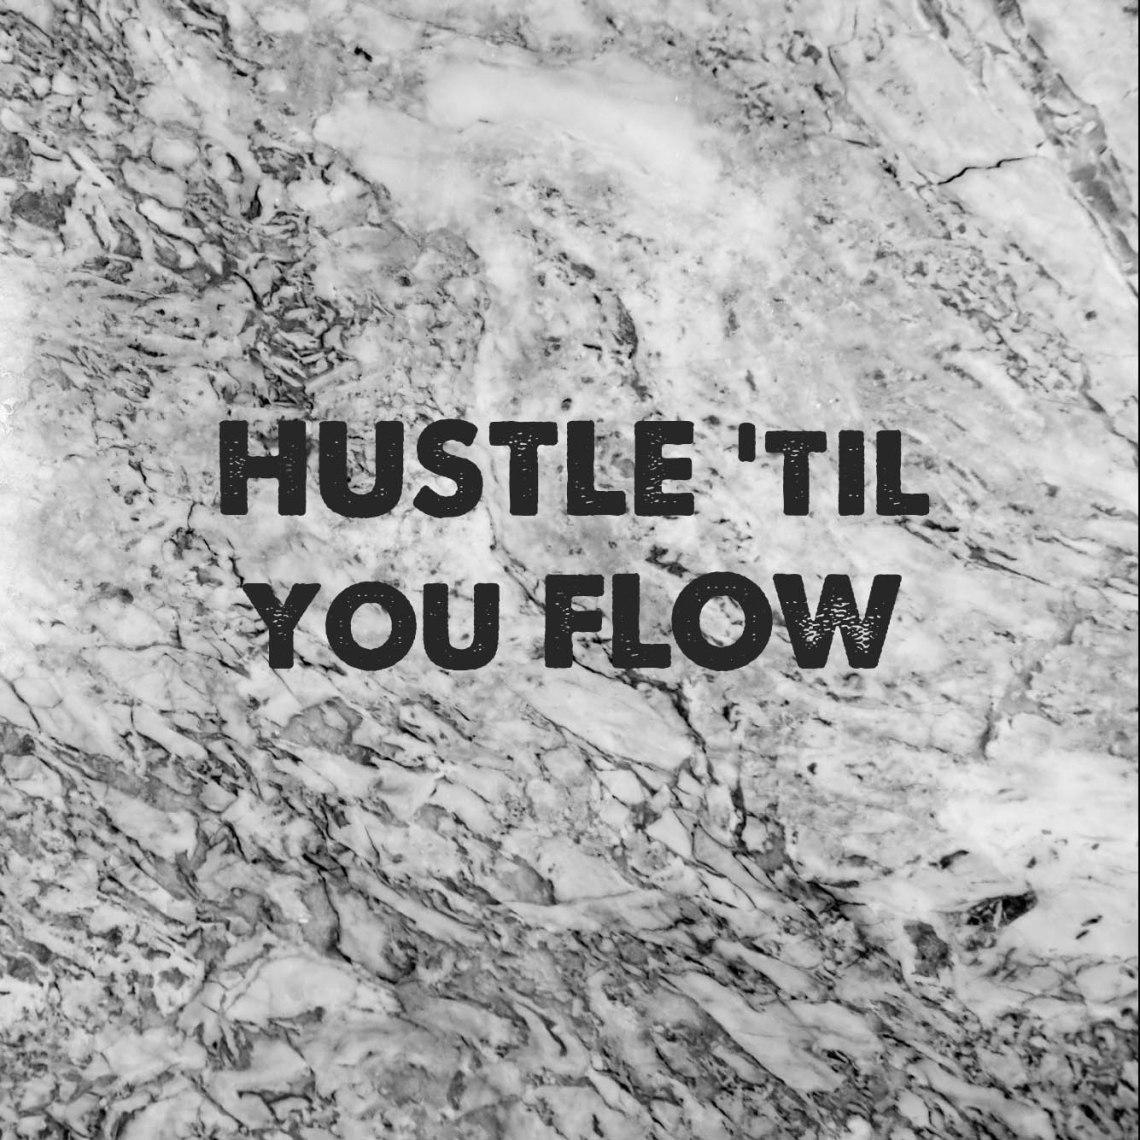 hustleflowmotivation.jpg